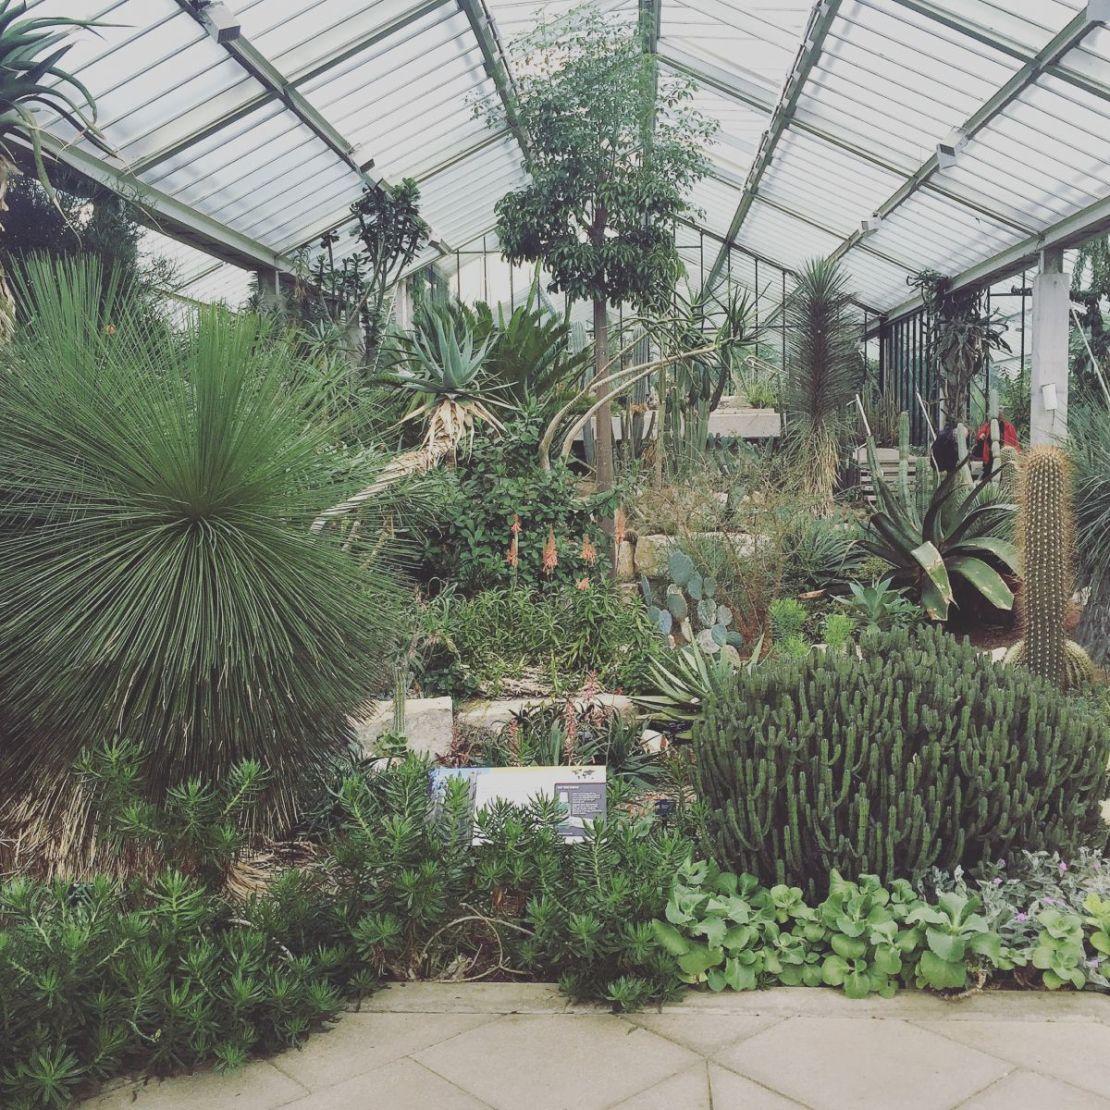 Princess of Wales Conservatory, Kew